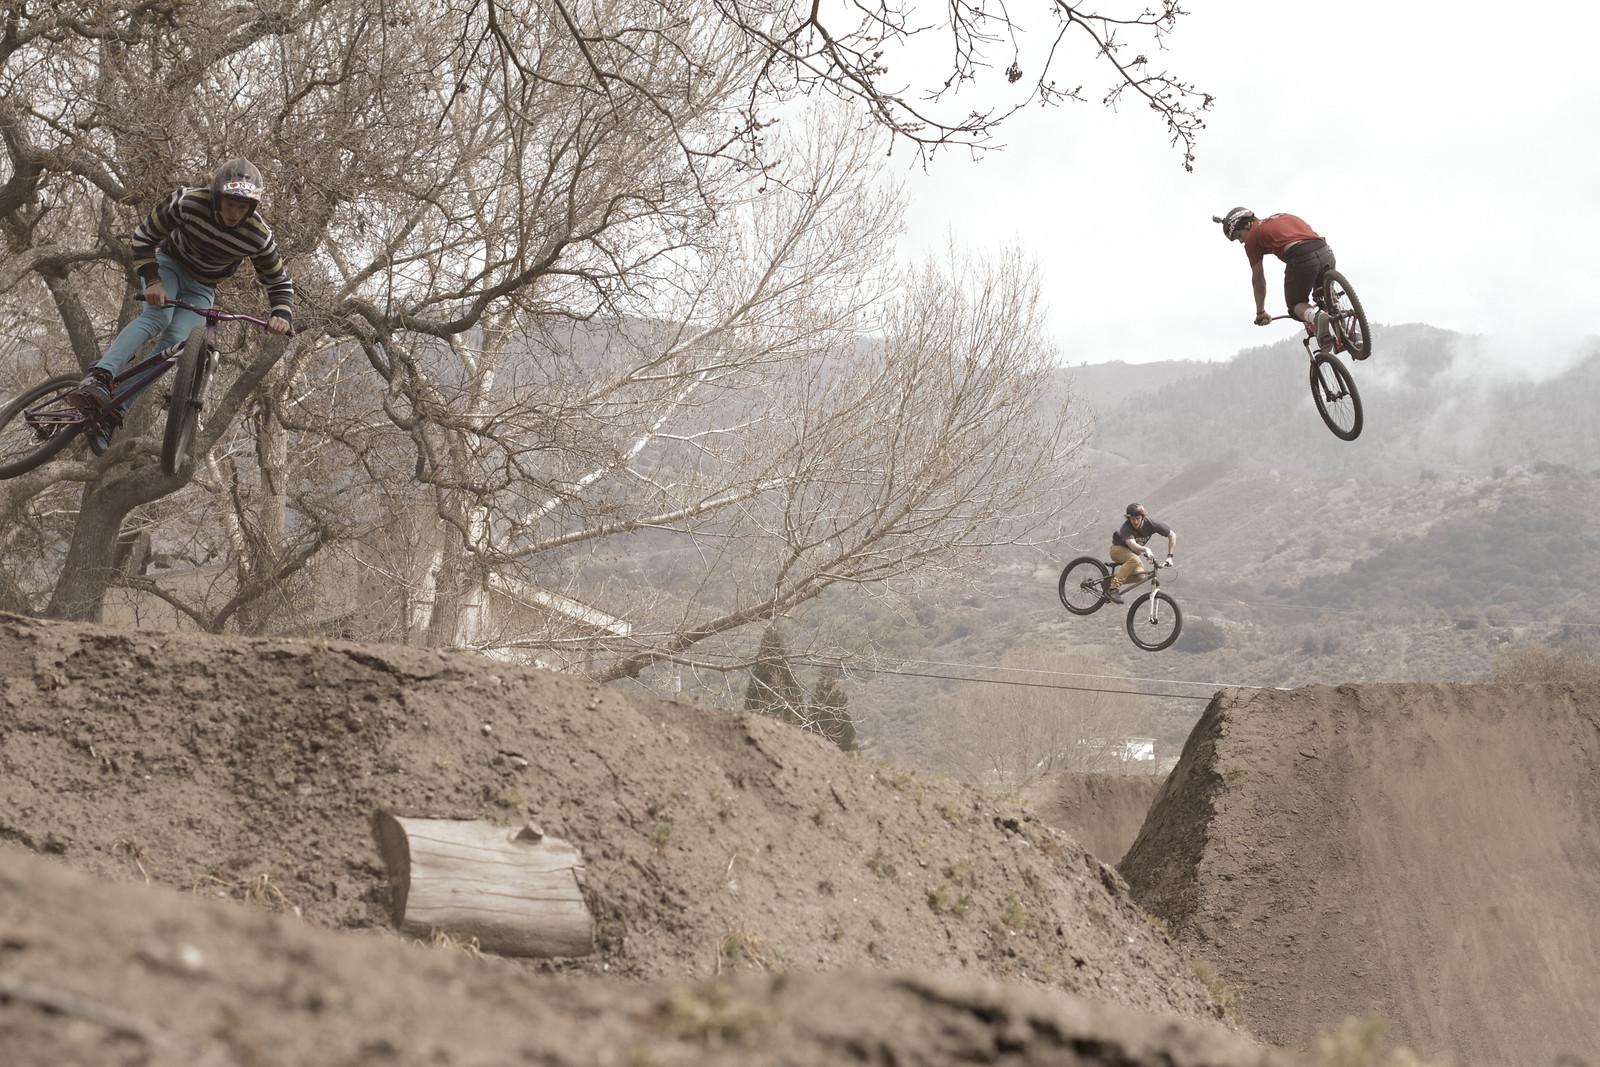 Carson Storch 360 During Mega Train - corytepper.com - Mountain Biking Pictures - Vital MTB